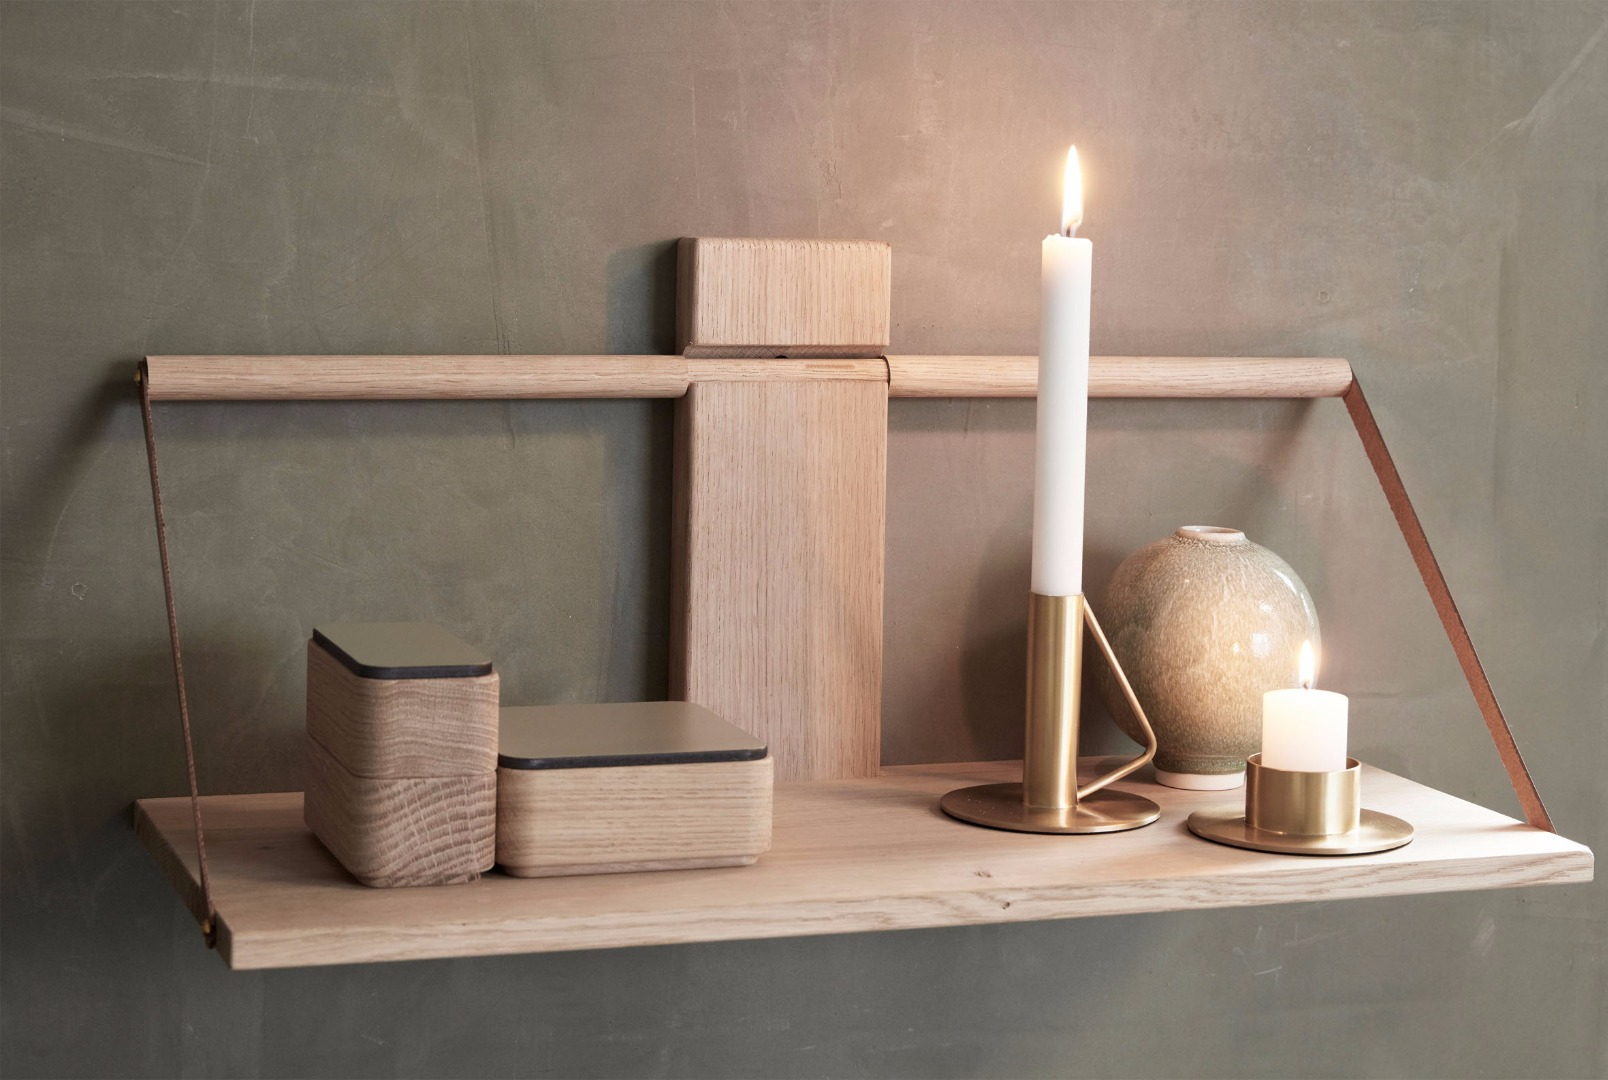 shelf-wood-wall-4.jpg